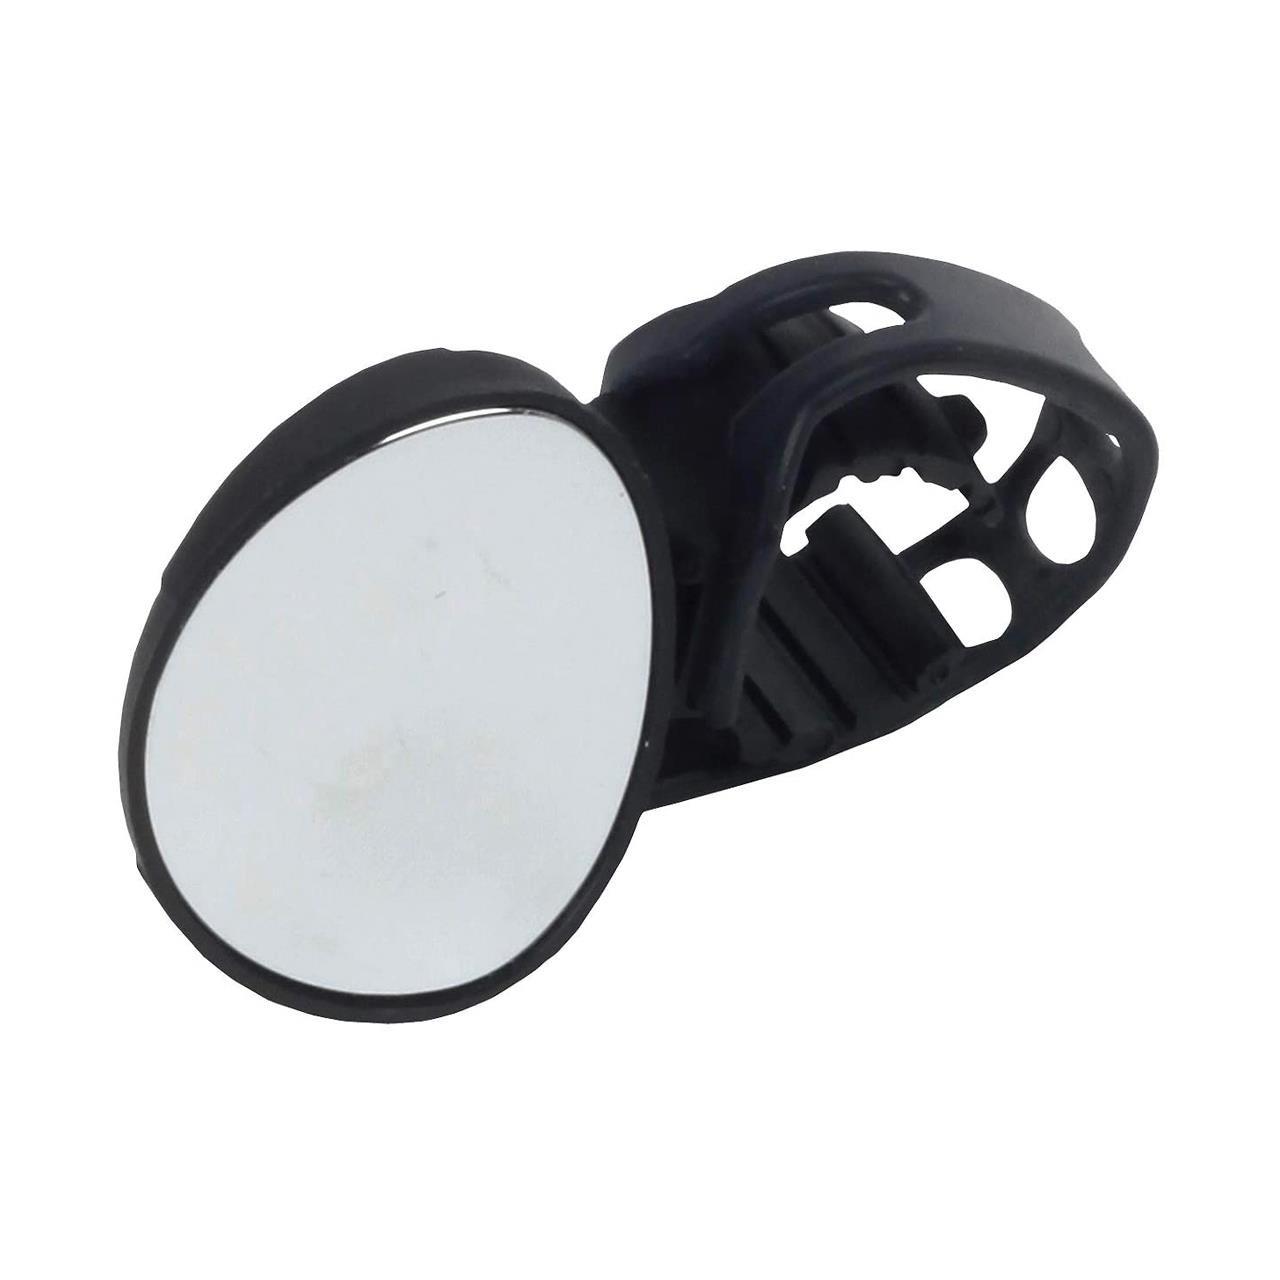 Zefal Spy Double Adjustment Bike Mirror